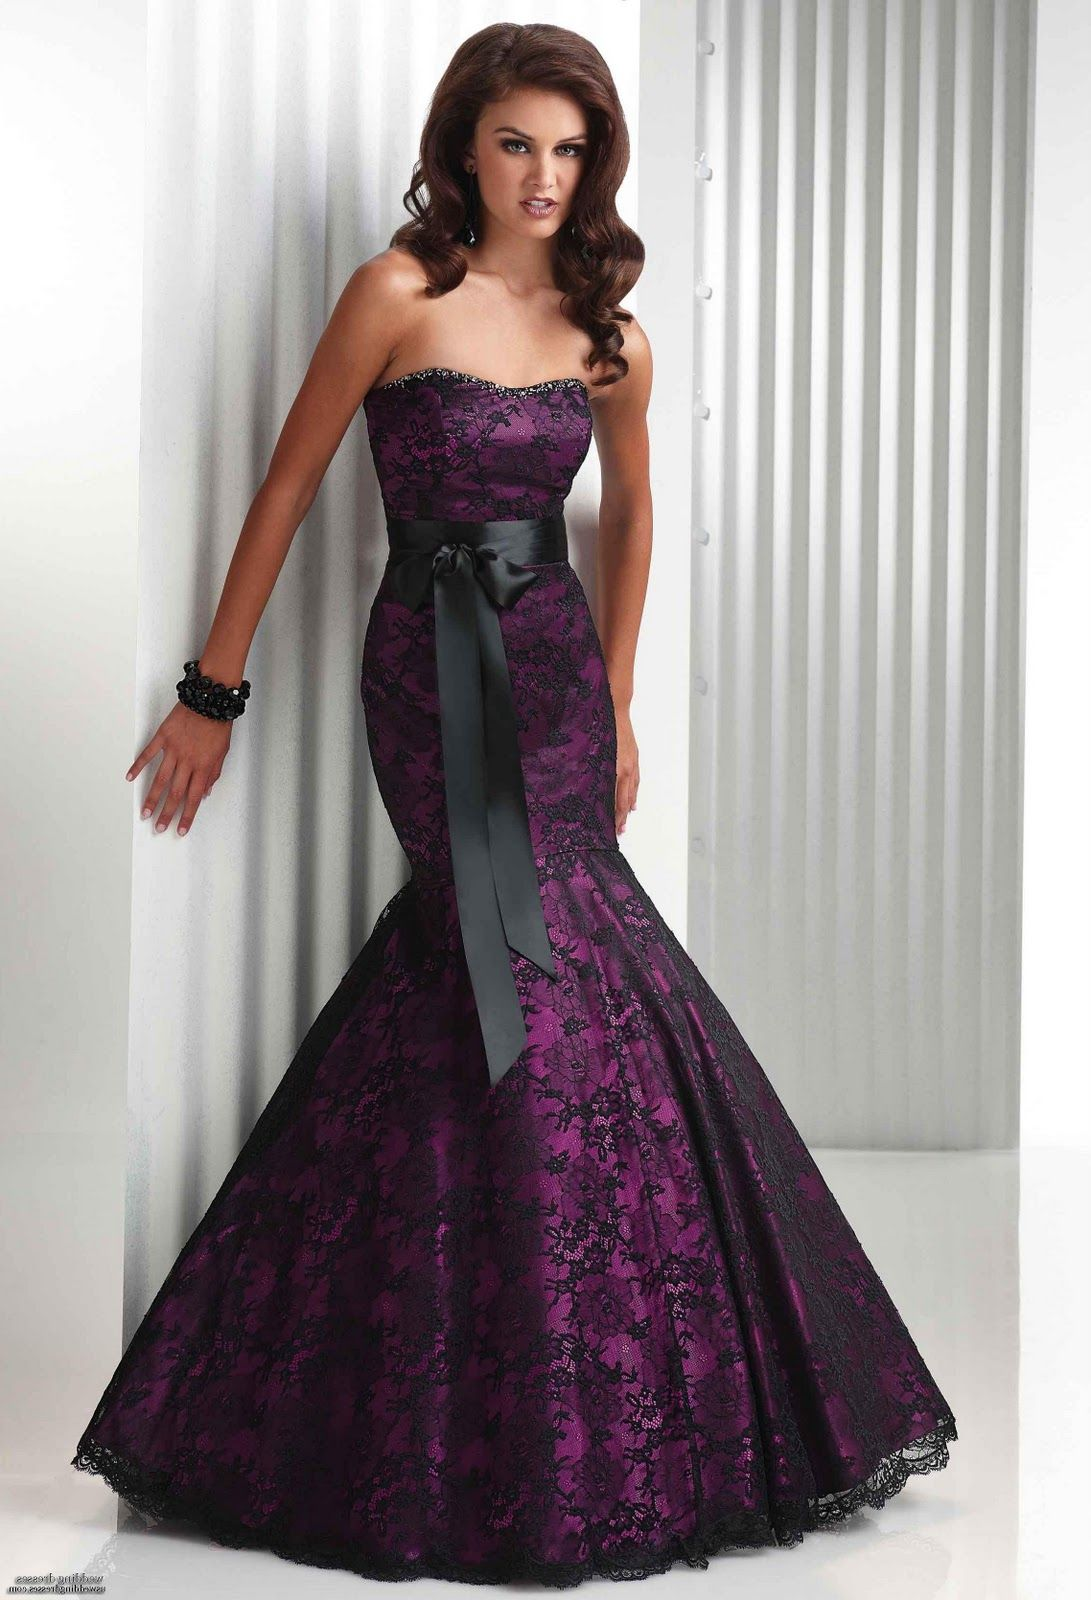 red gothic wedding dress gothic wedding dresses Wilmide s blog black gothic wedding dresses could show of w girls